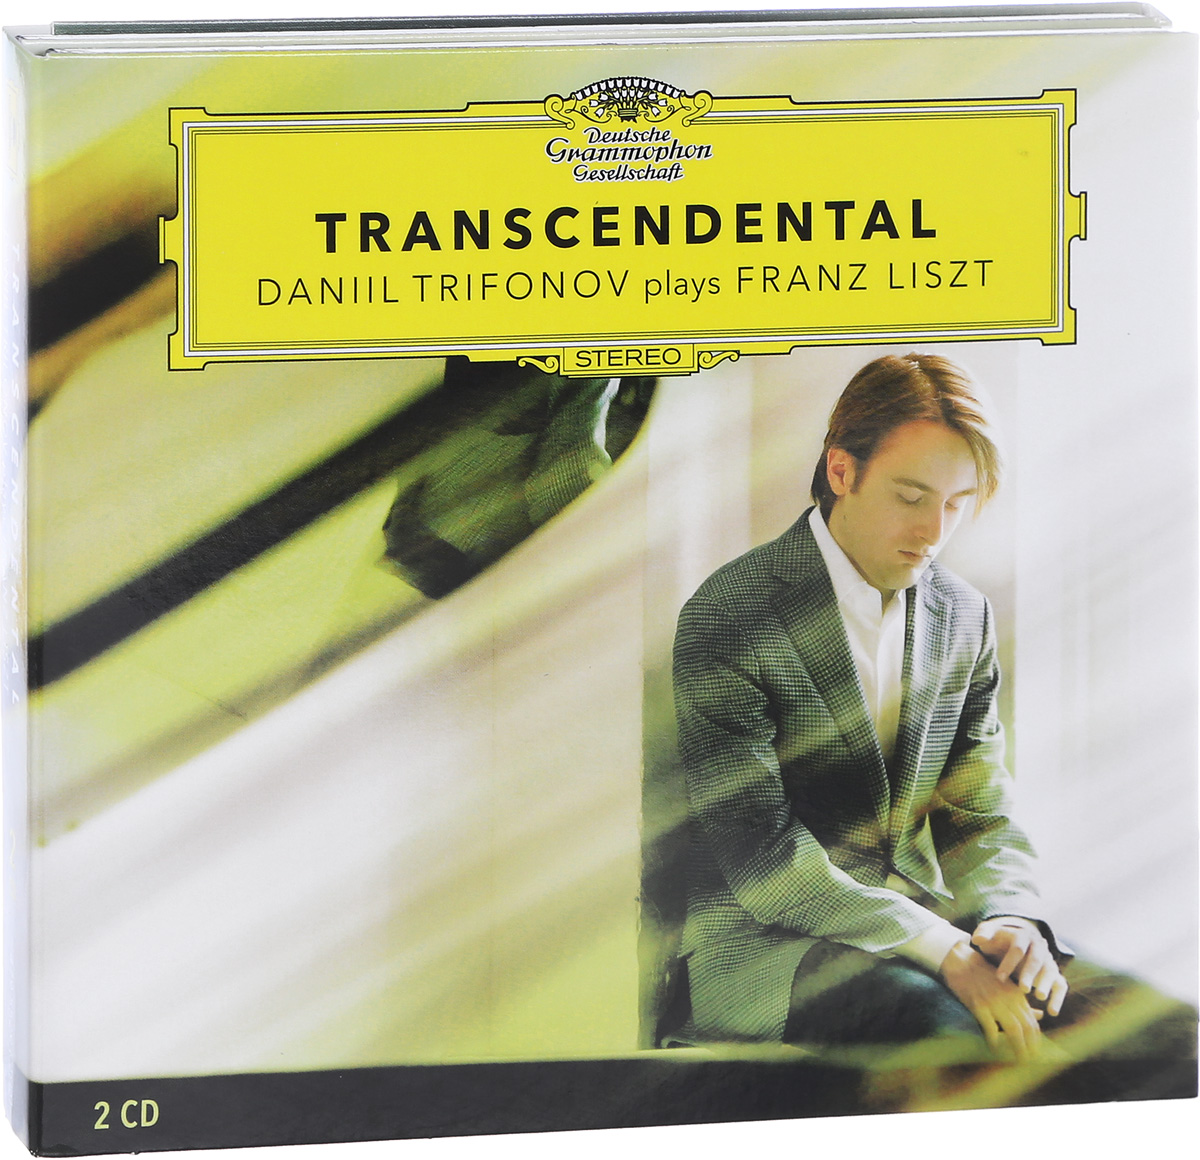 Даниил Трифонов Daniil Trifonov. Franz Liszt. Transcendental (2 CD) daniil trifonov chopin evocations